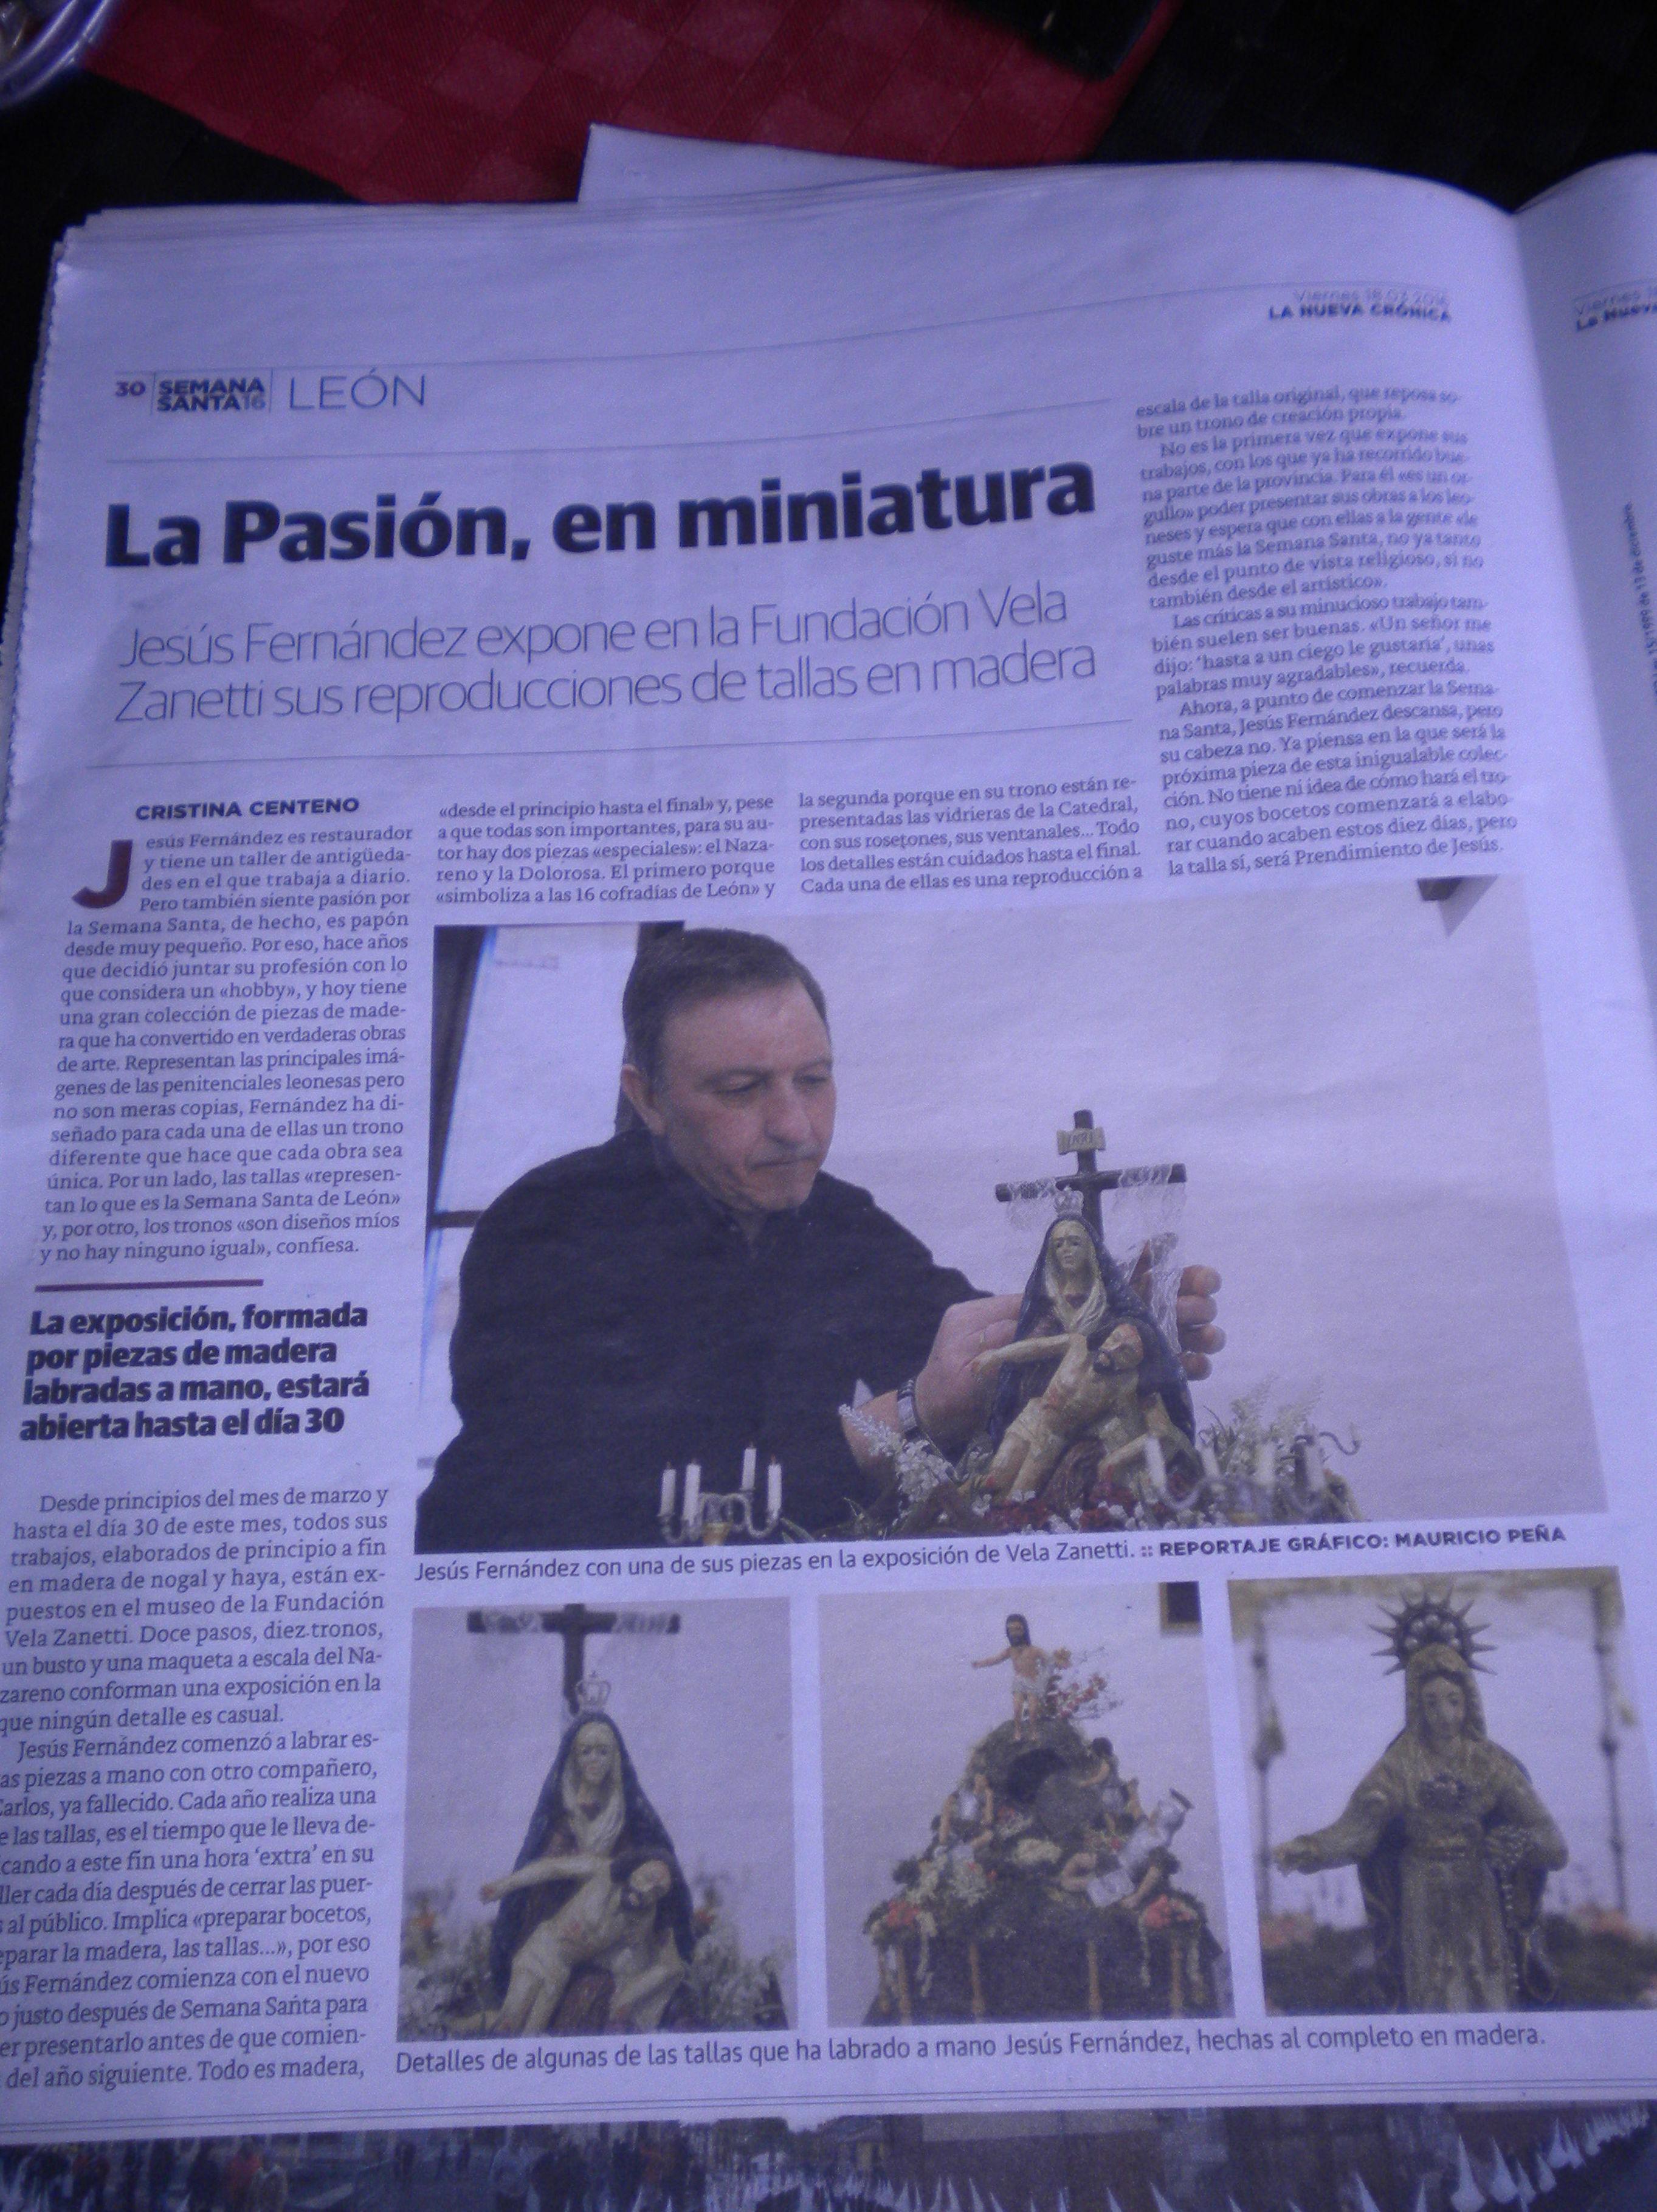 diario de Leon